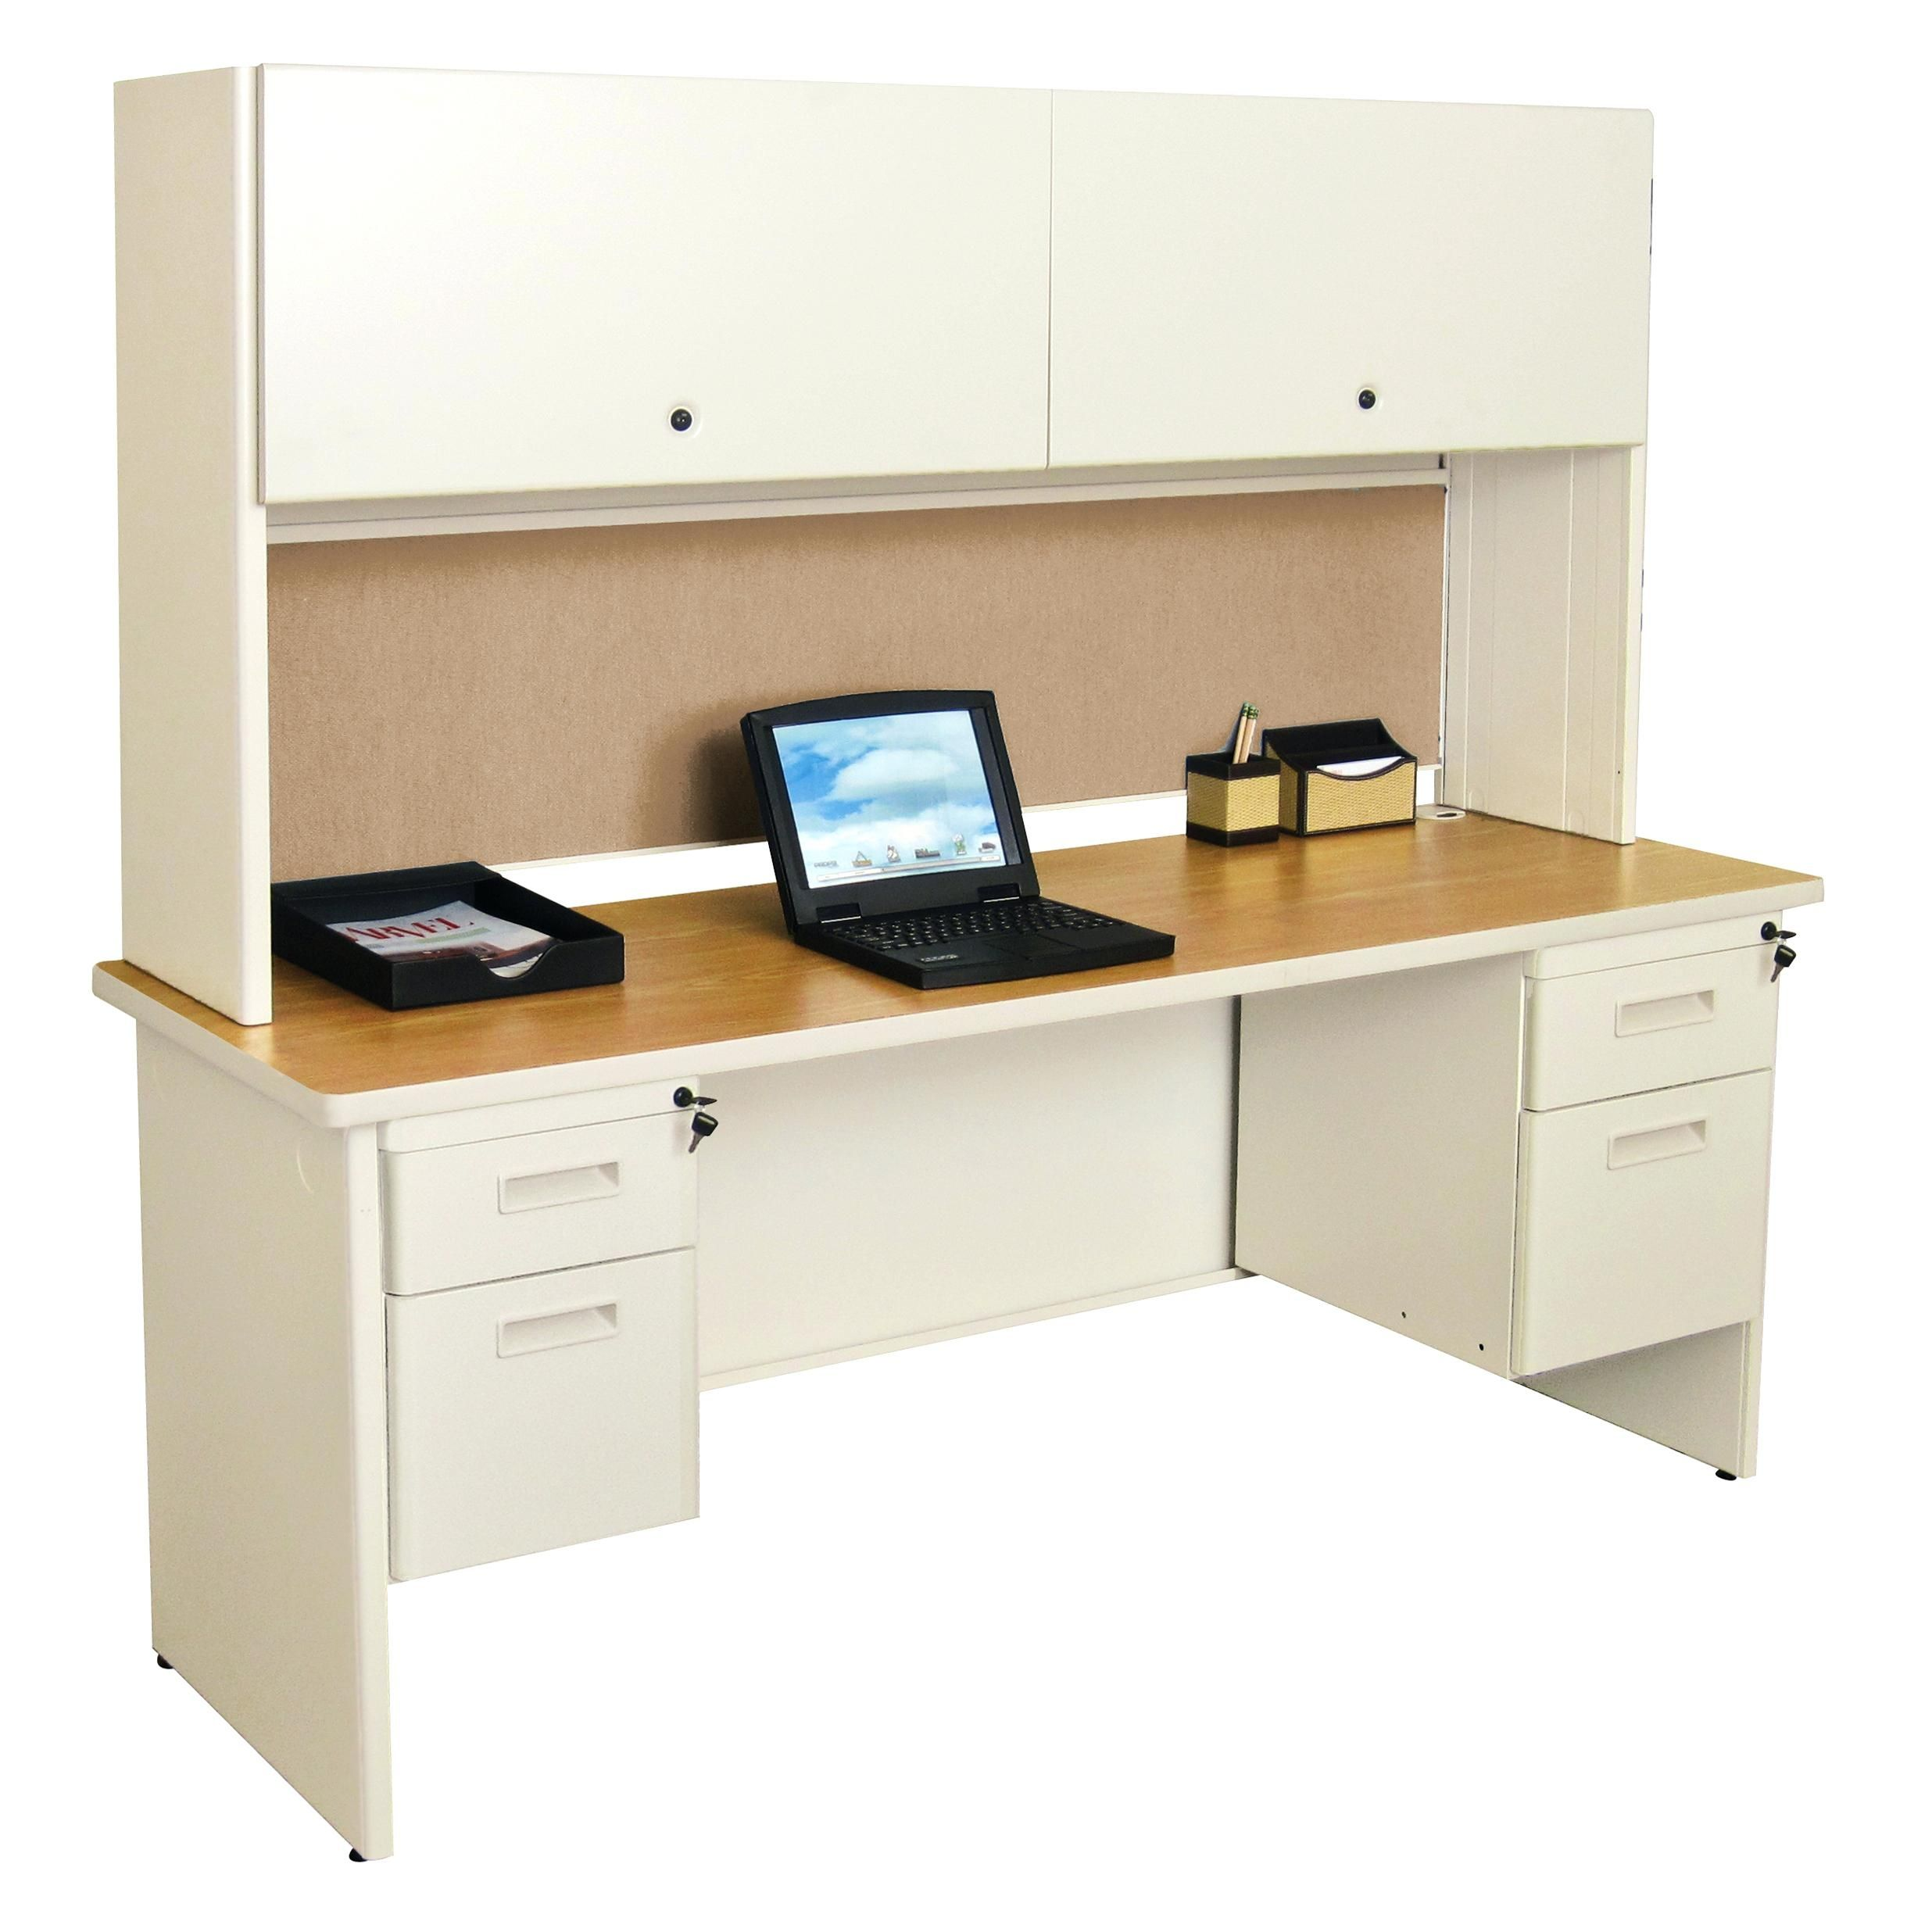 17 Long Computer Desk | http://devintavern.com | Pinterest | Long ...